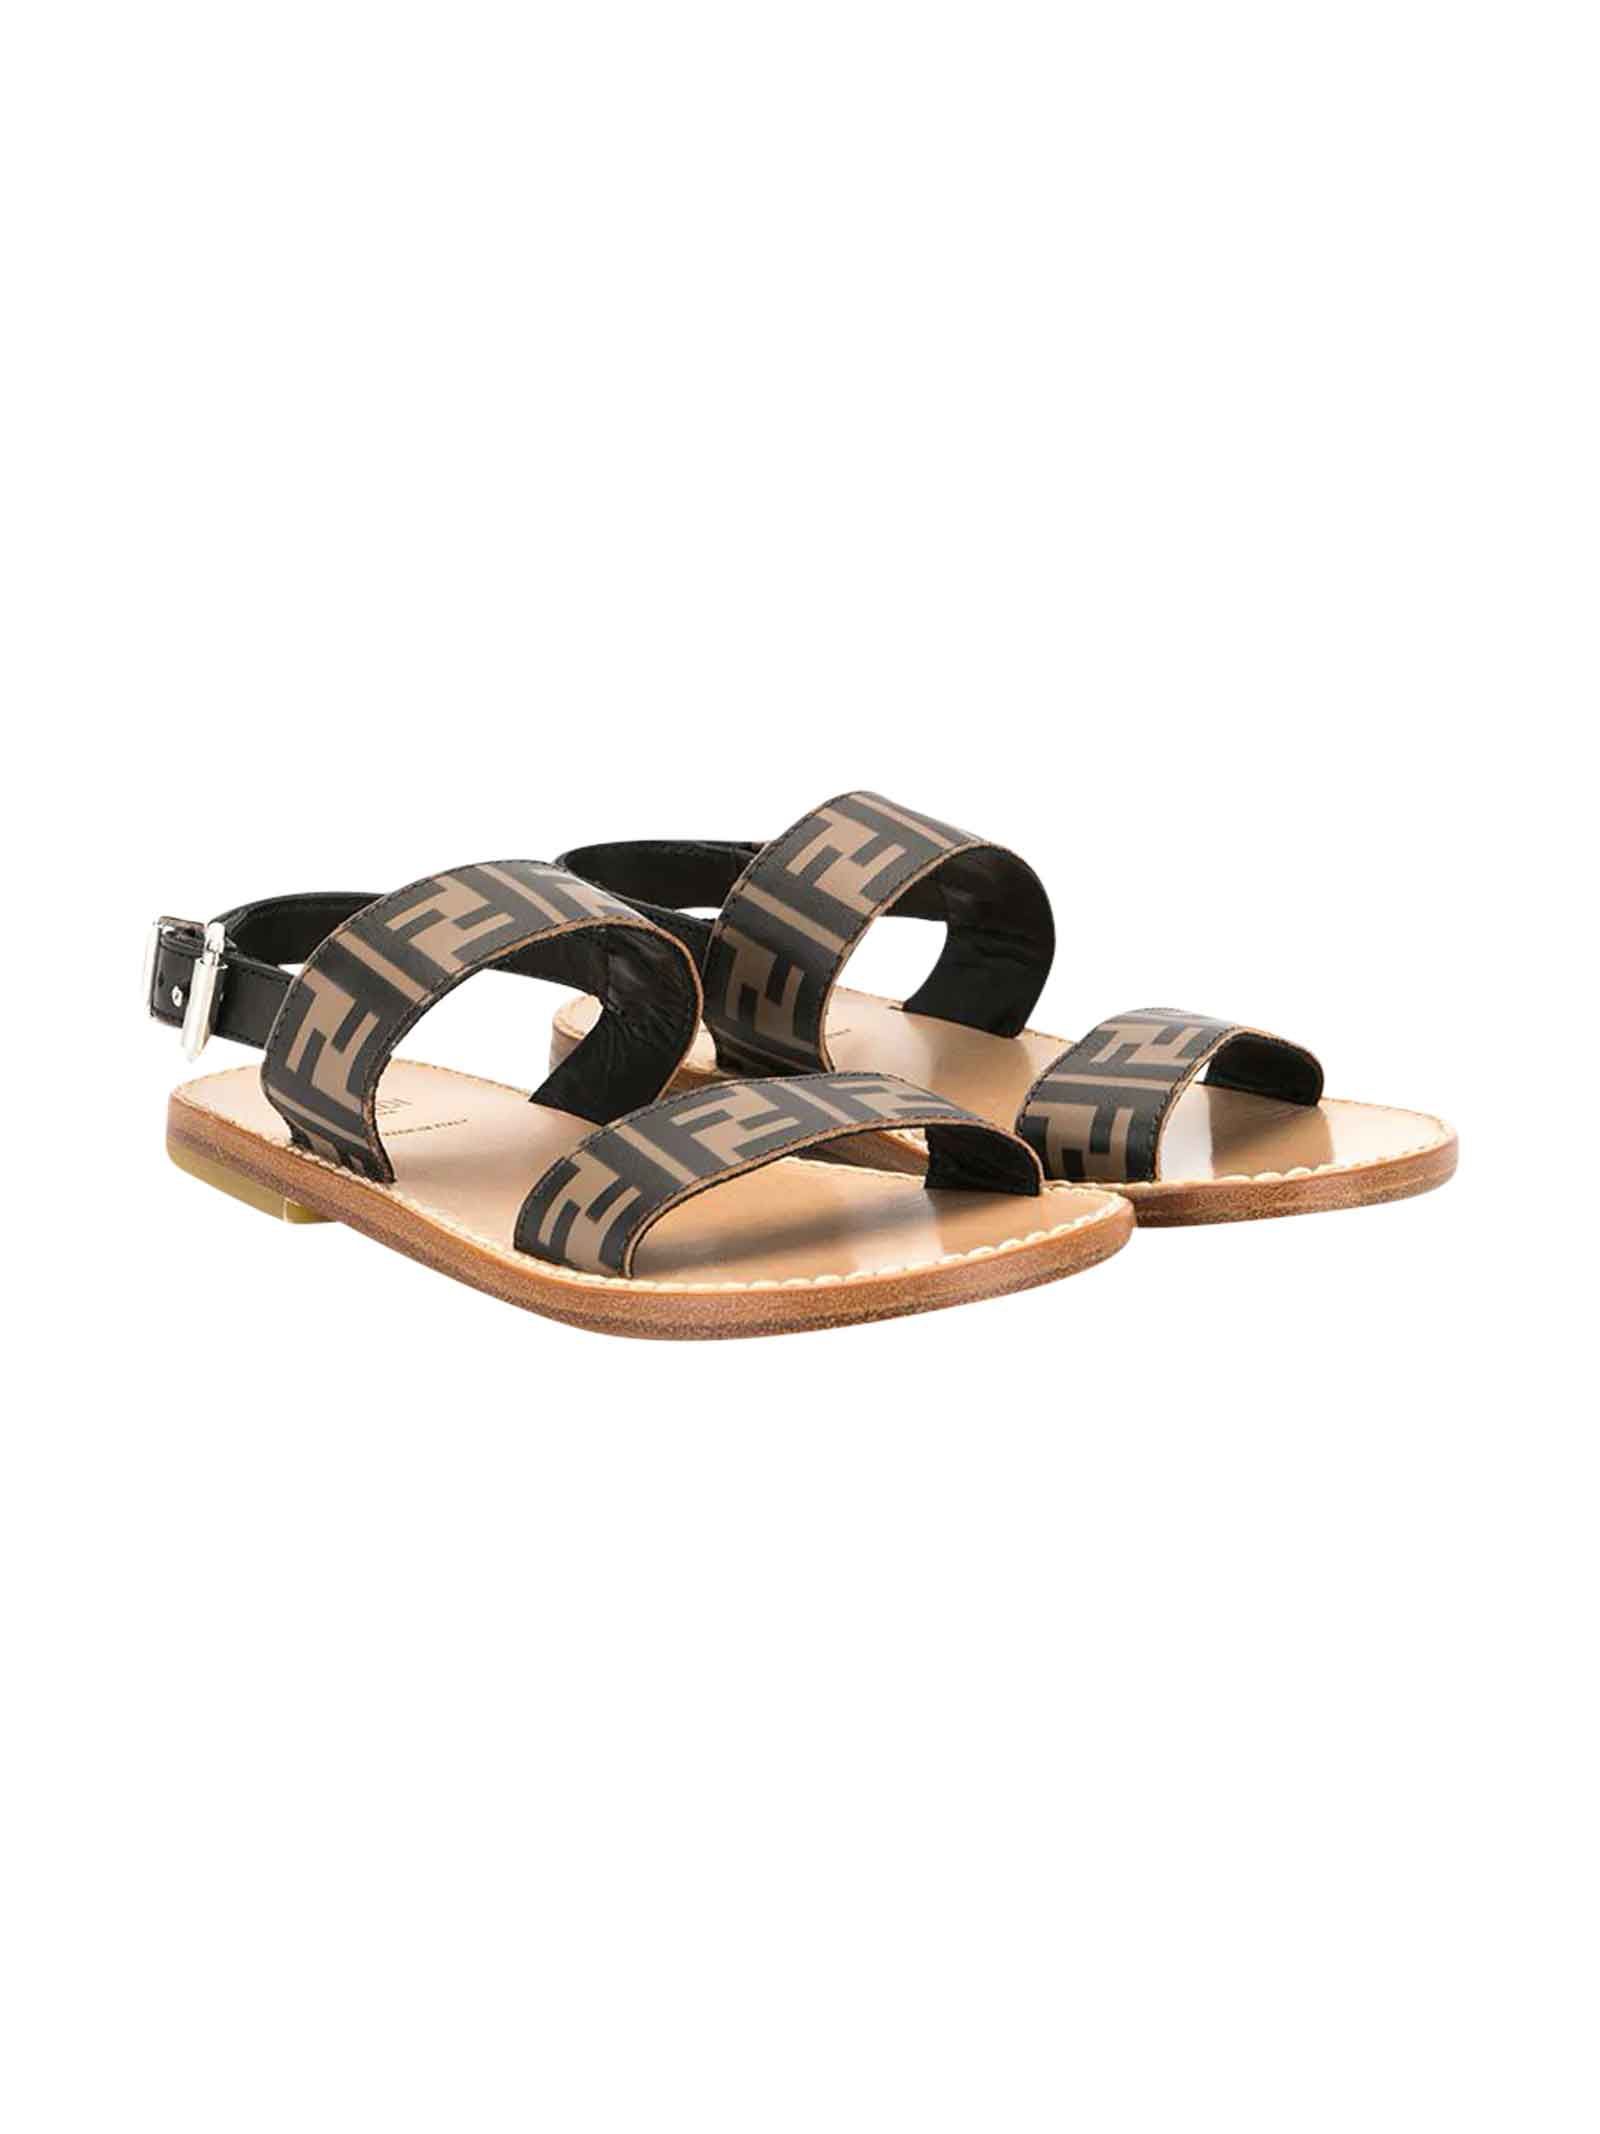 Brown Fendi kids logo sandals - FENDI